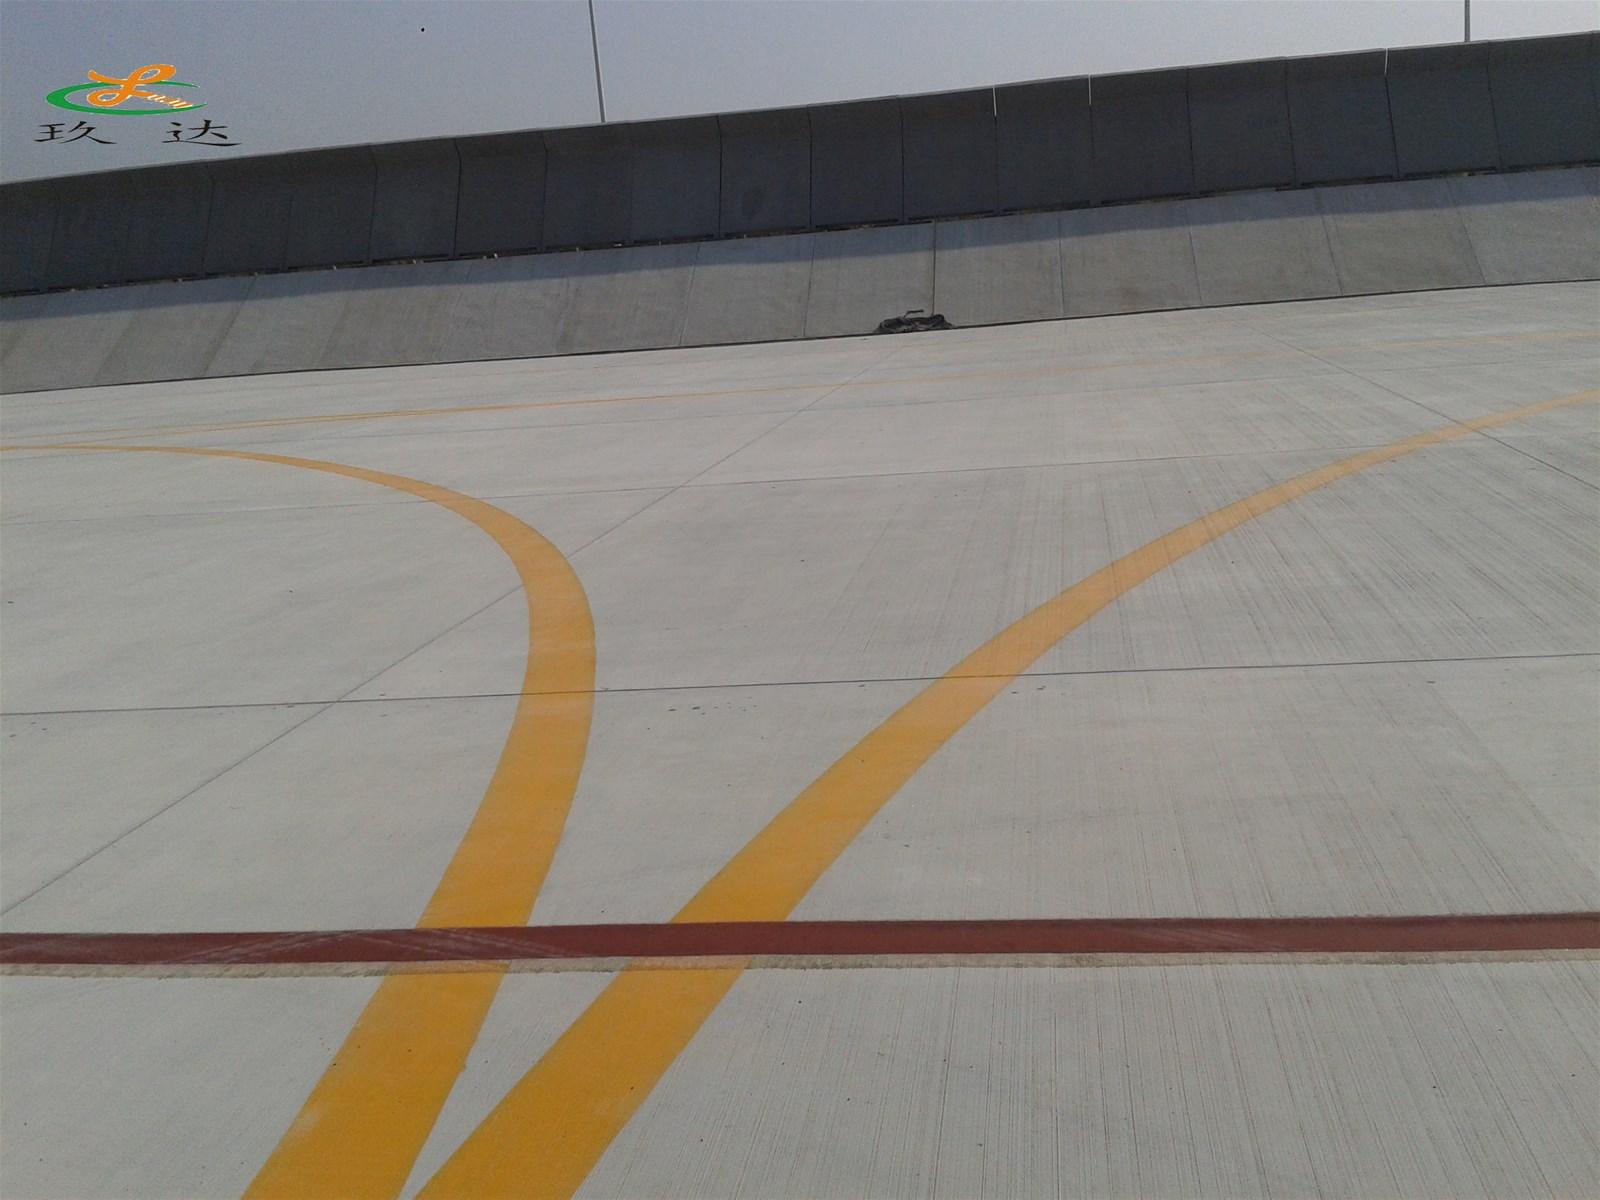 MMA TwoComponent Concrete Pavement Marking Material MMA Cold Plastic